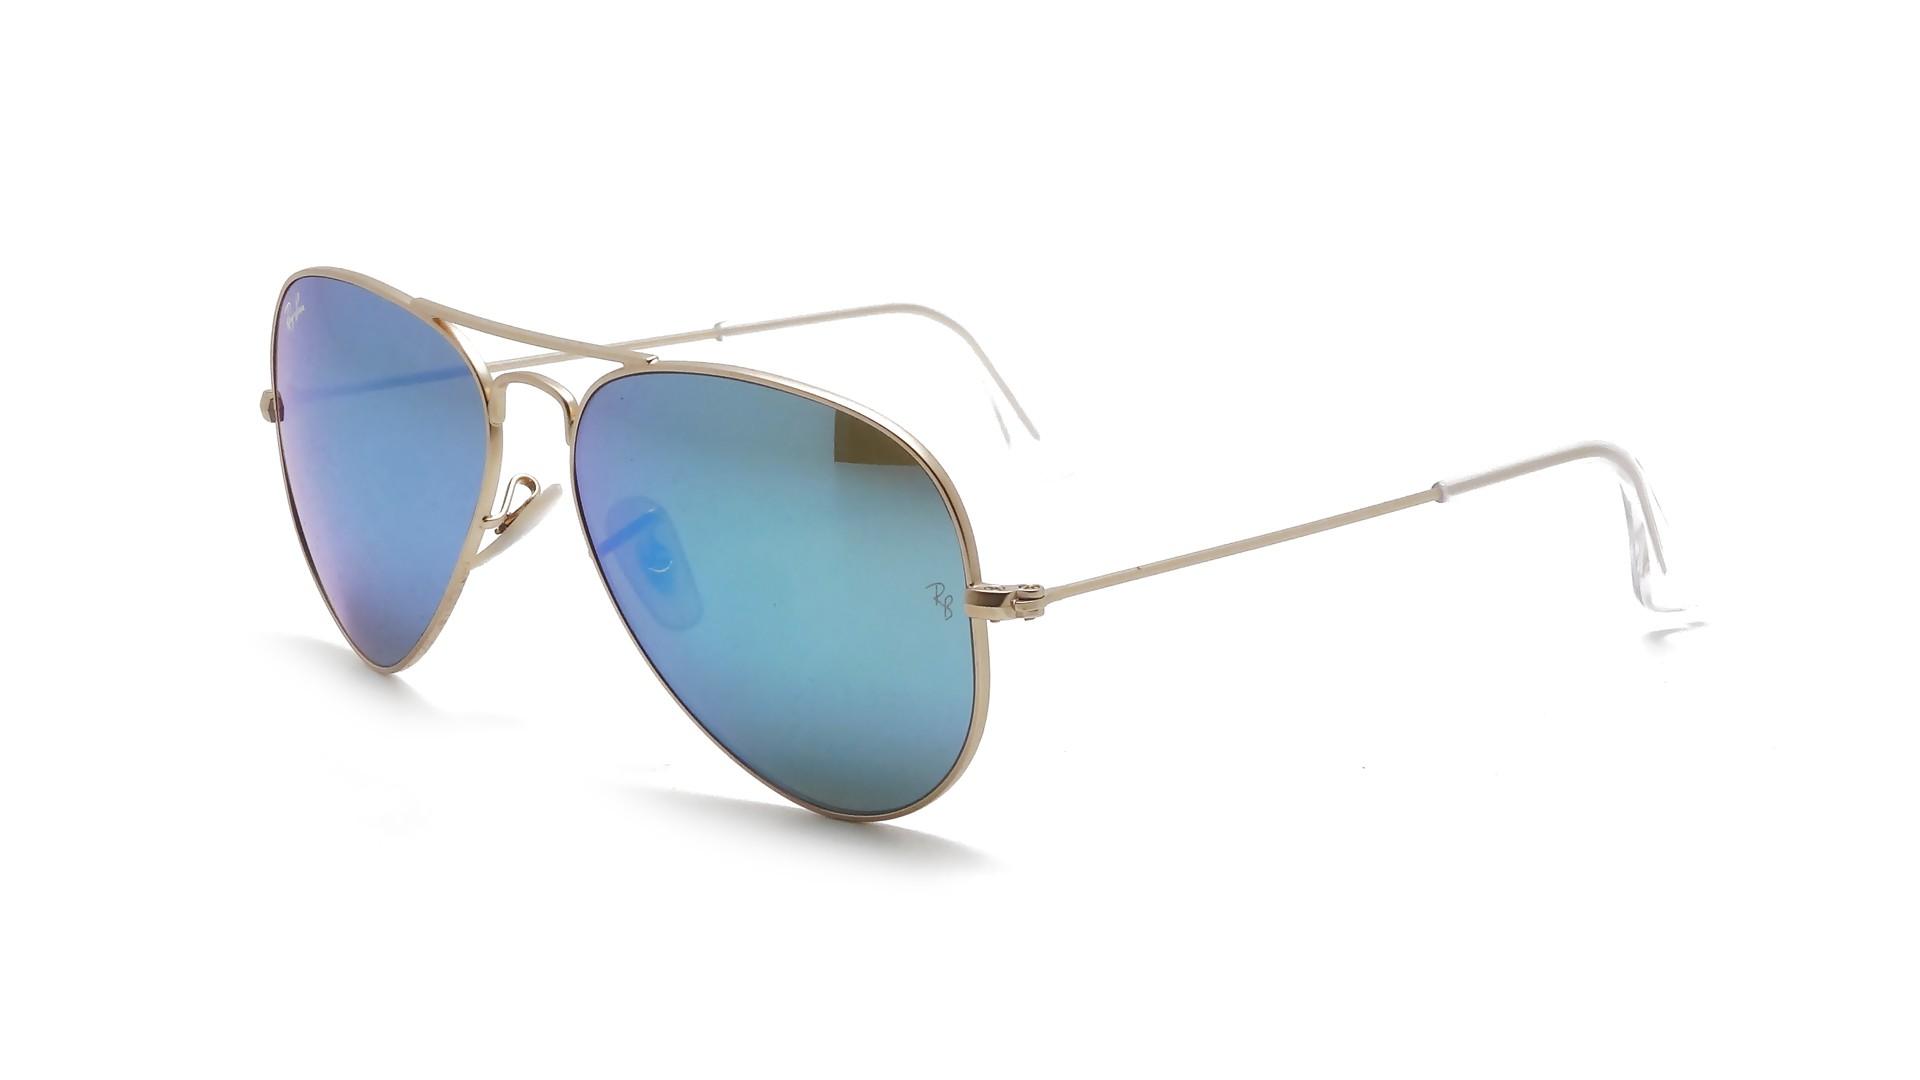 800099c334 Sunglasses Ray-Ban Aviator Large Metal Gold RB3025 112 17 55-14 Medium  Mirror